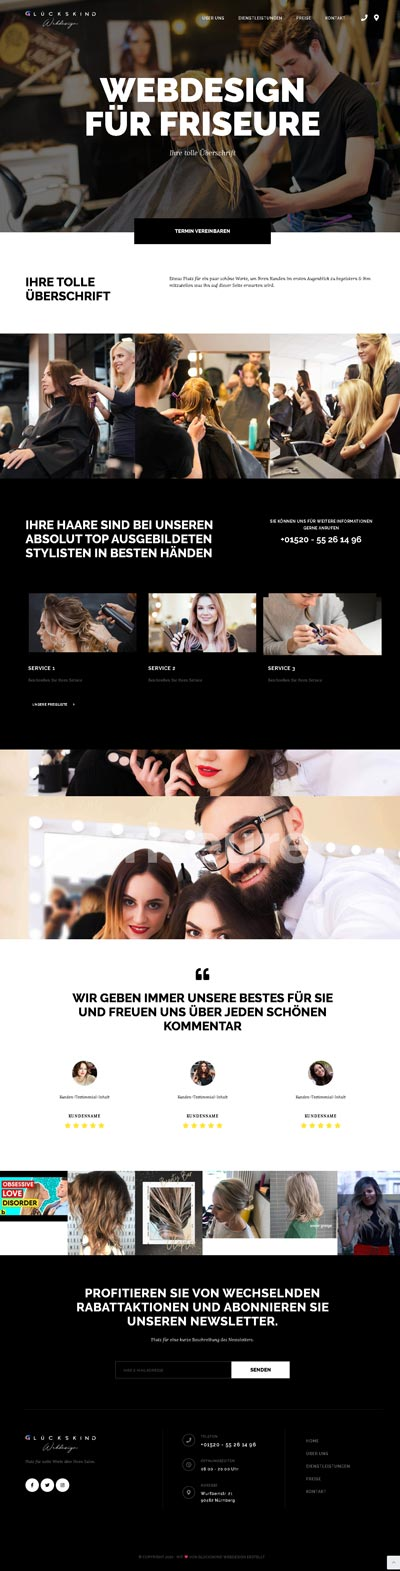 Friseur Murphyy - Glückskind Webdesign Musterkatalog